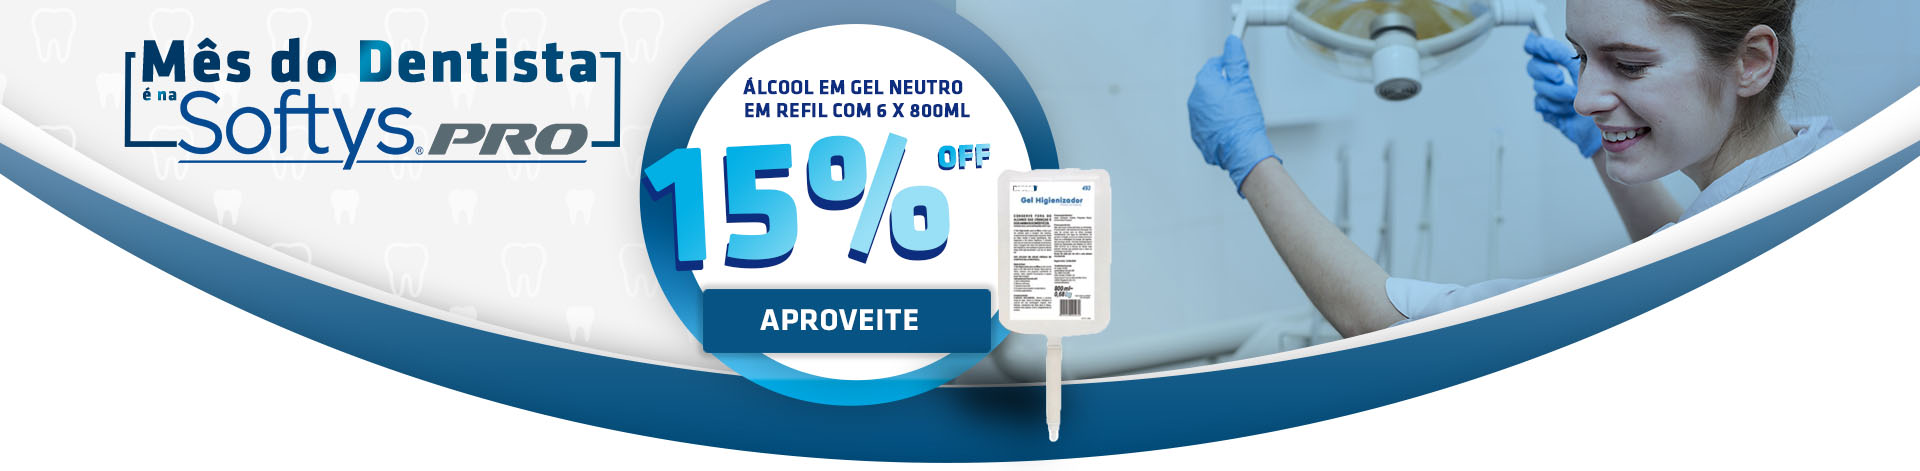 Álcool 15% OFF - SDSOPRO-46